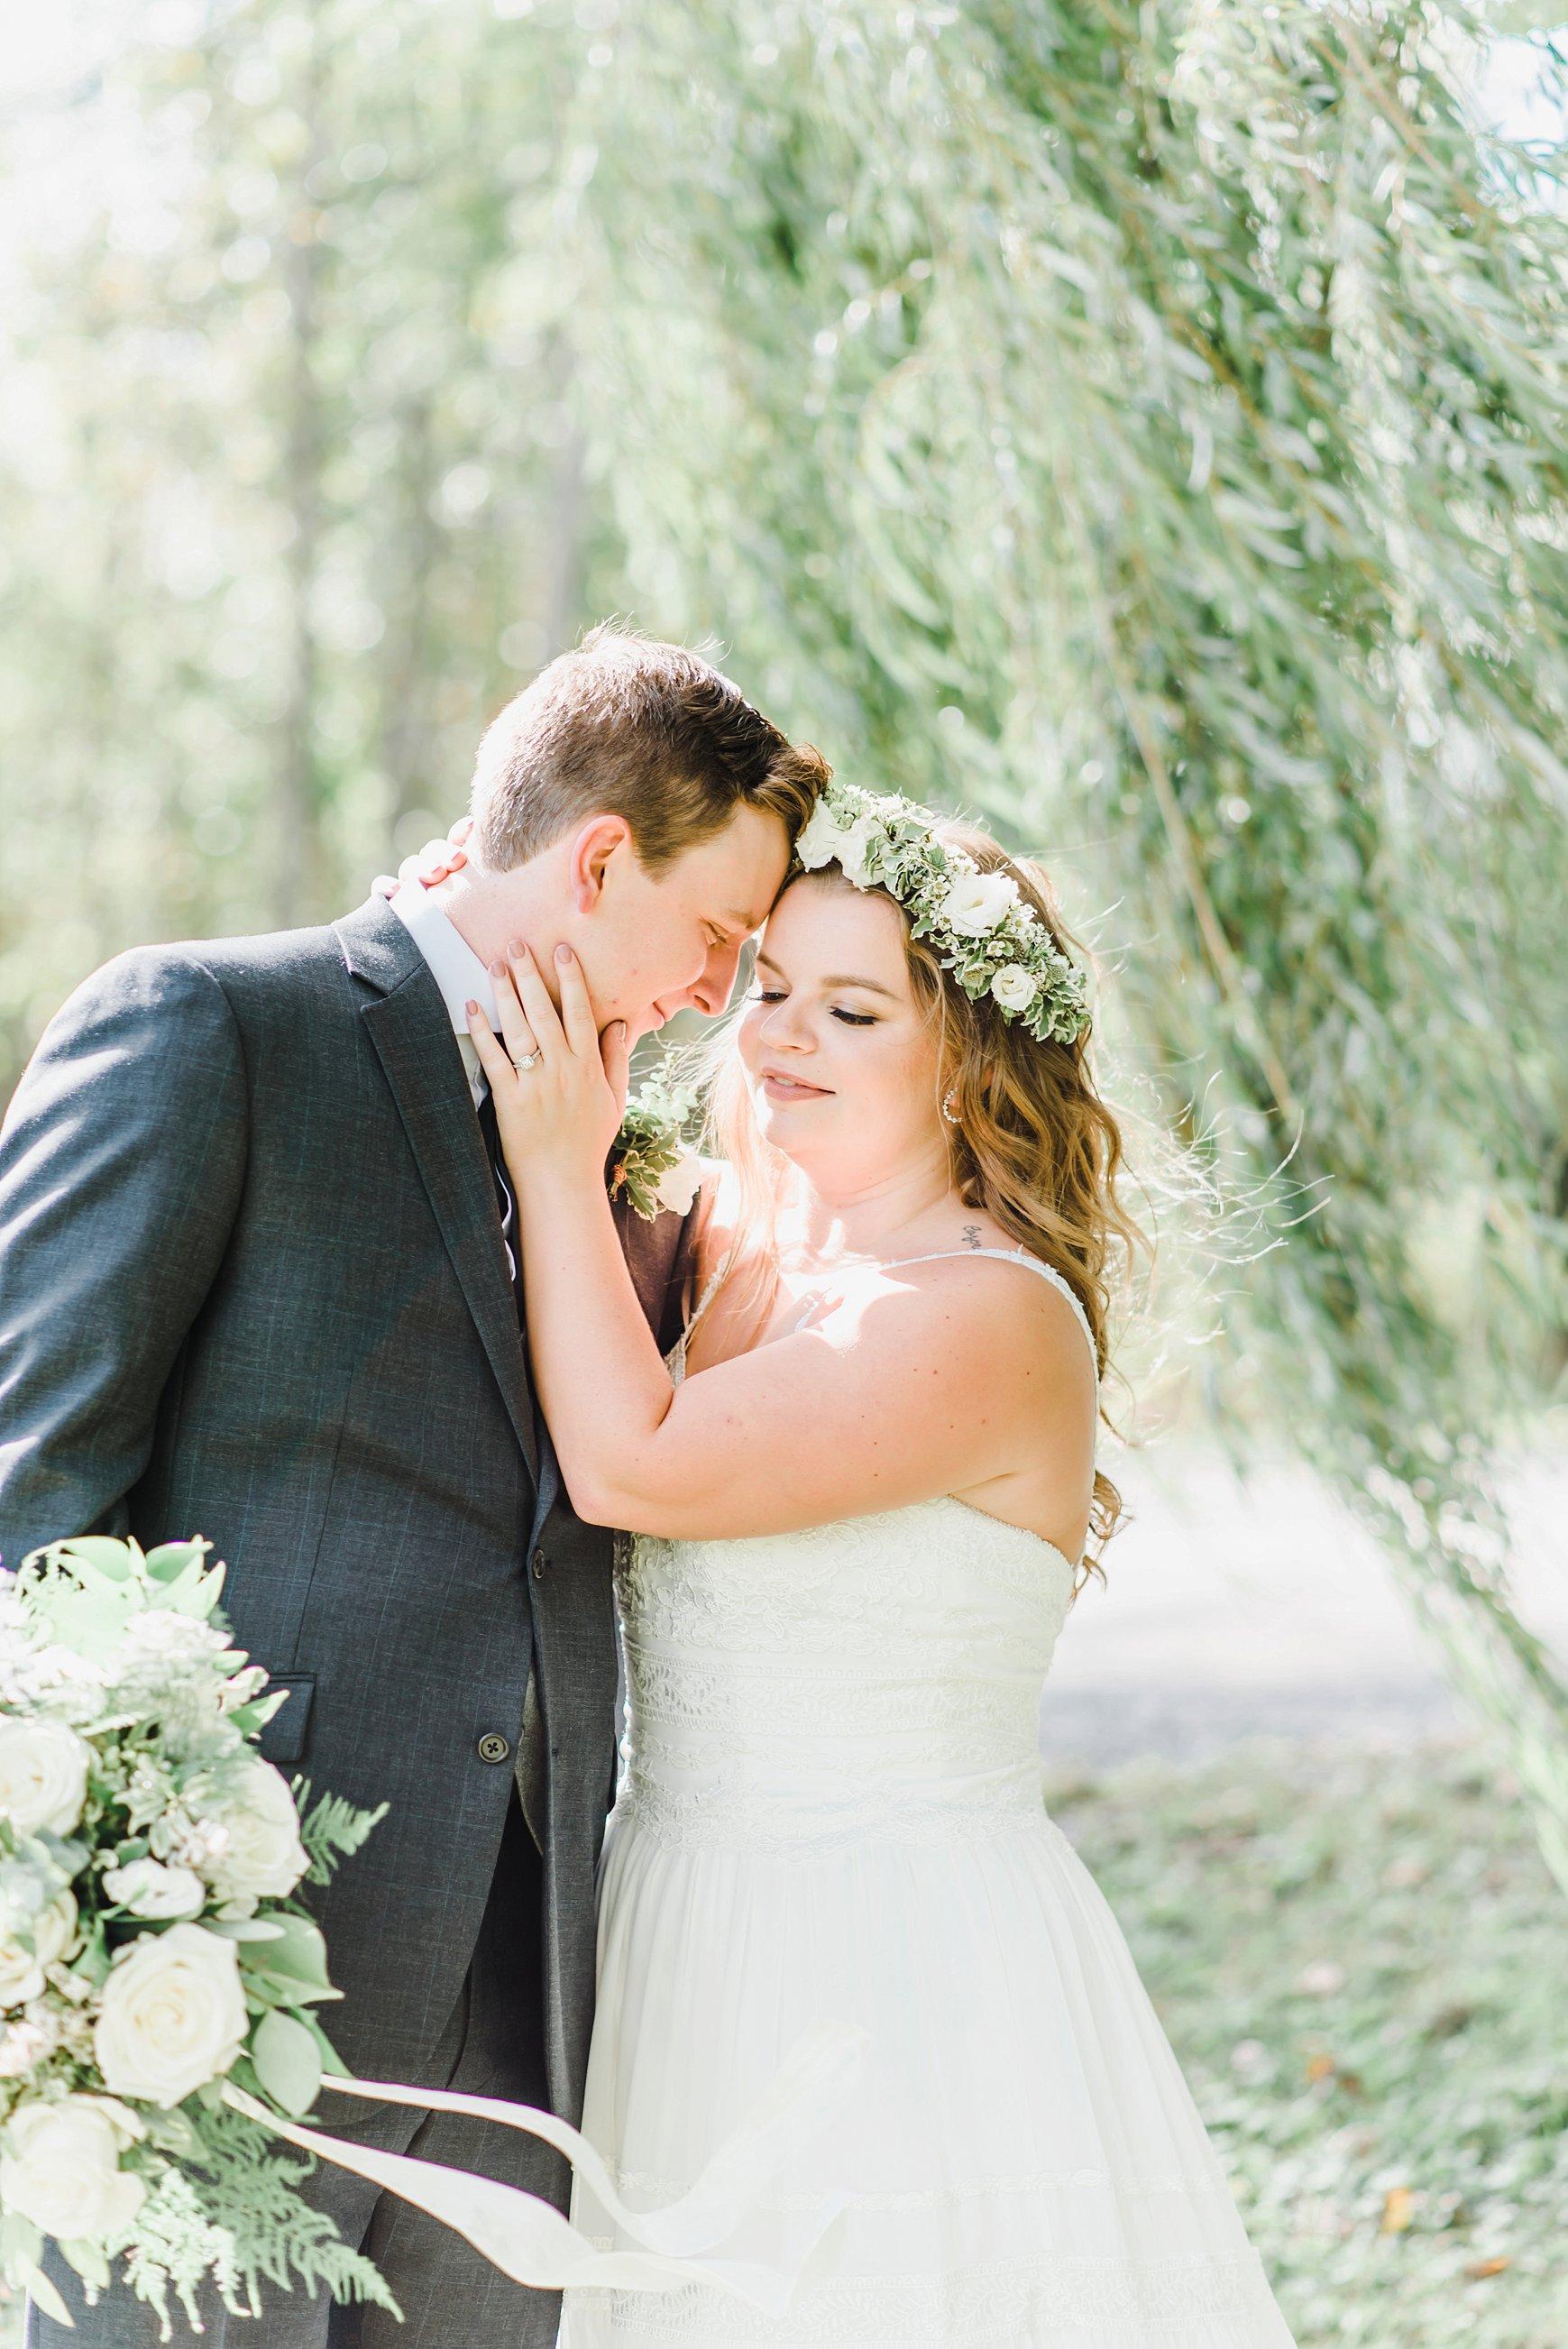 light airy indie fine art ottawa wedding photographer | Ali and Batoul Photography_1106.jpg